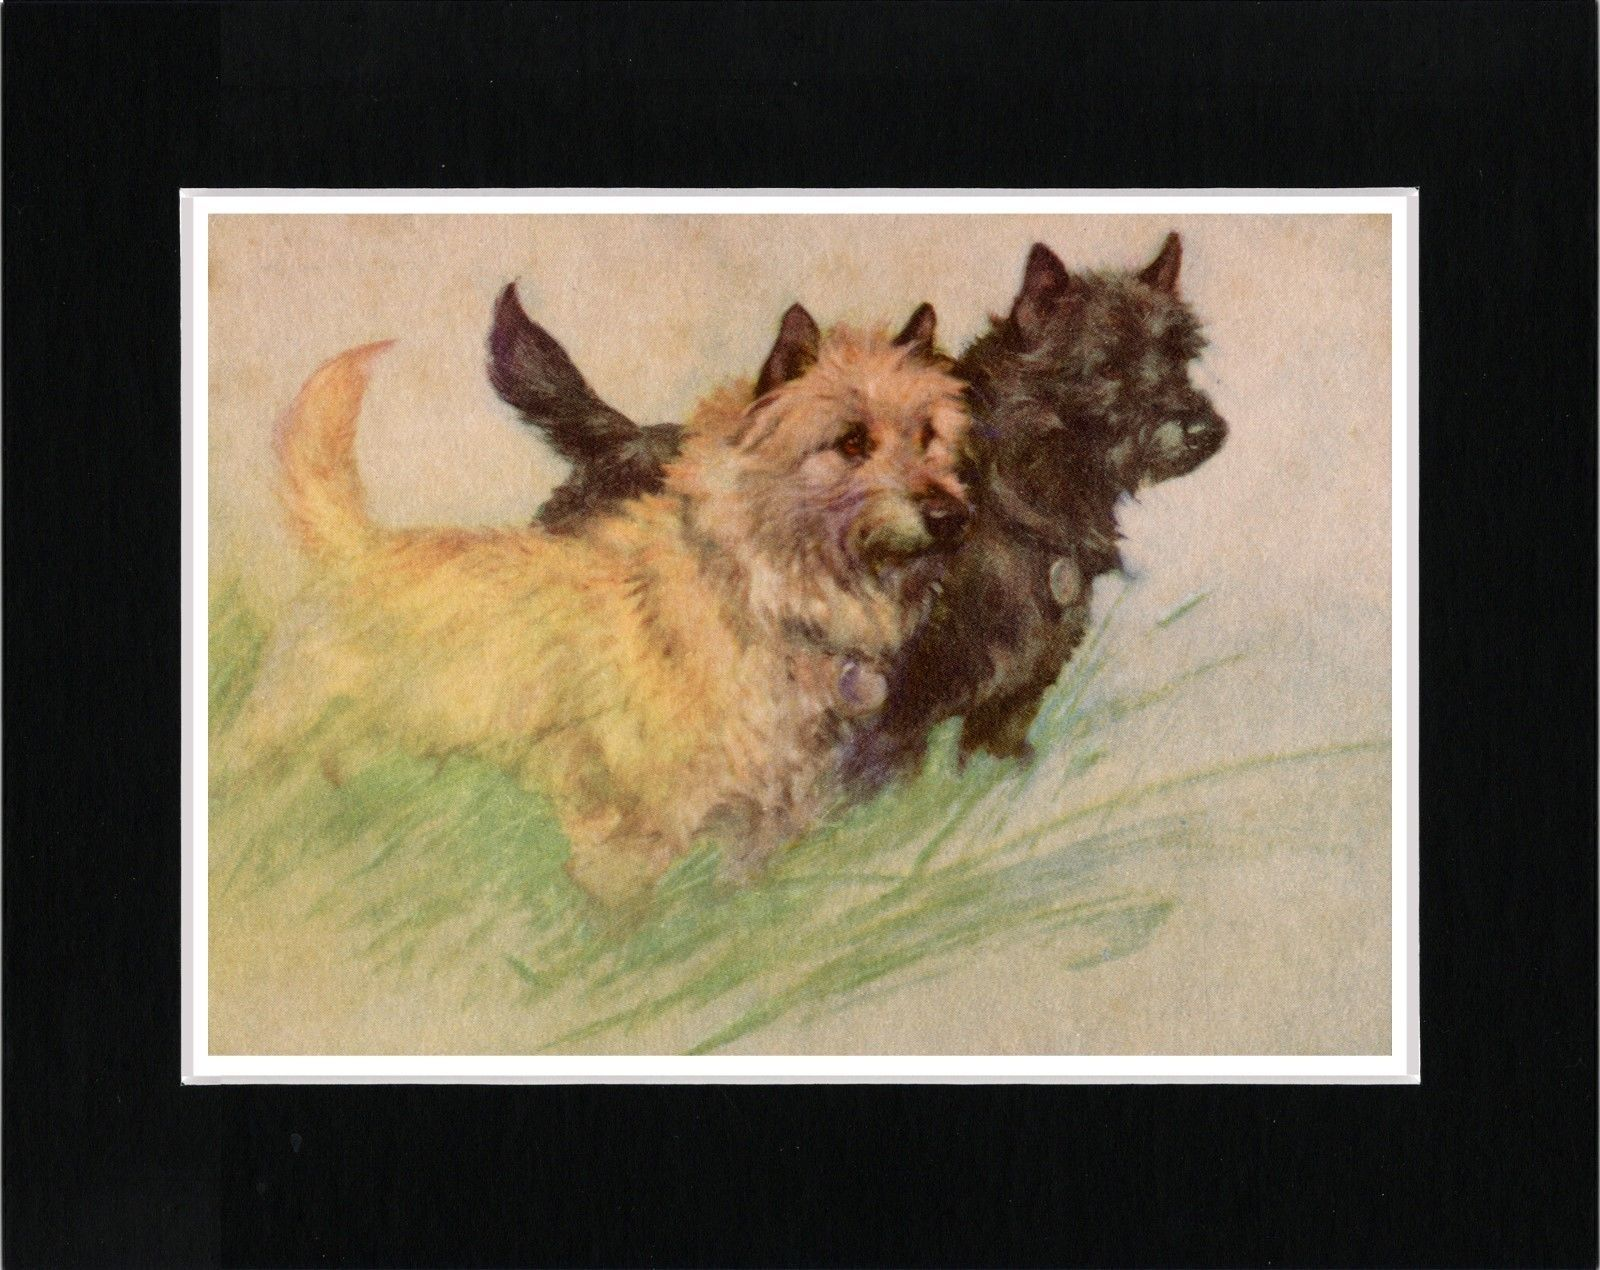 Cairn Terrier Dogs Lovely Vintage Style Dog Art Print Matted Ready To Frame Ebay Dog Print Art Dog Art Cairn Terrier